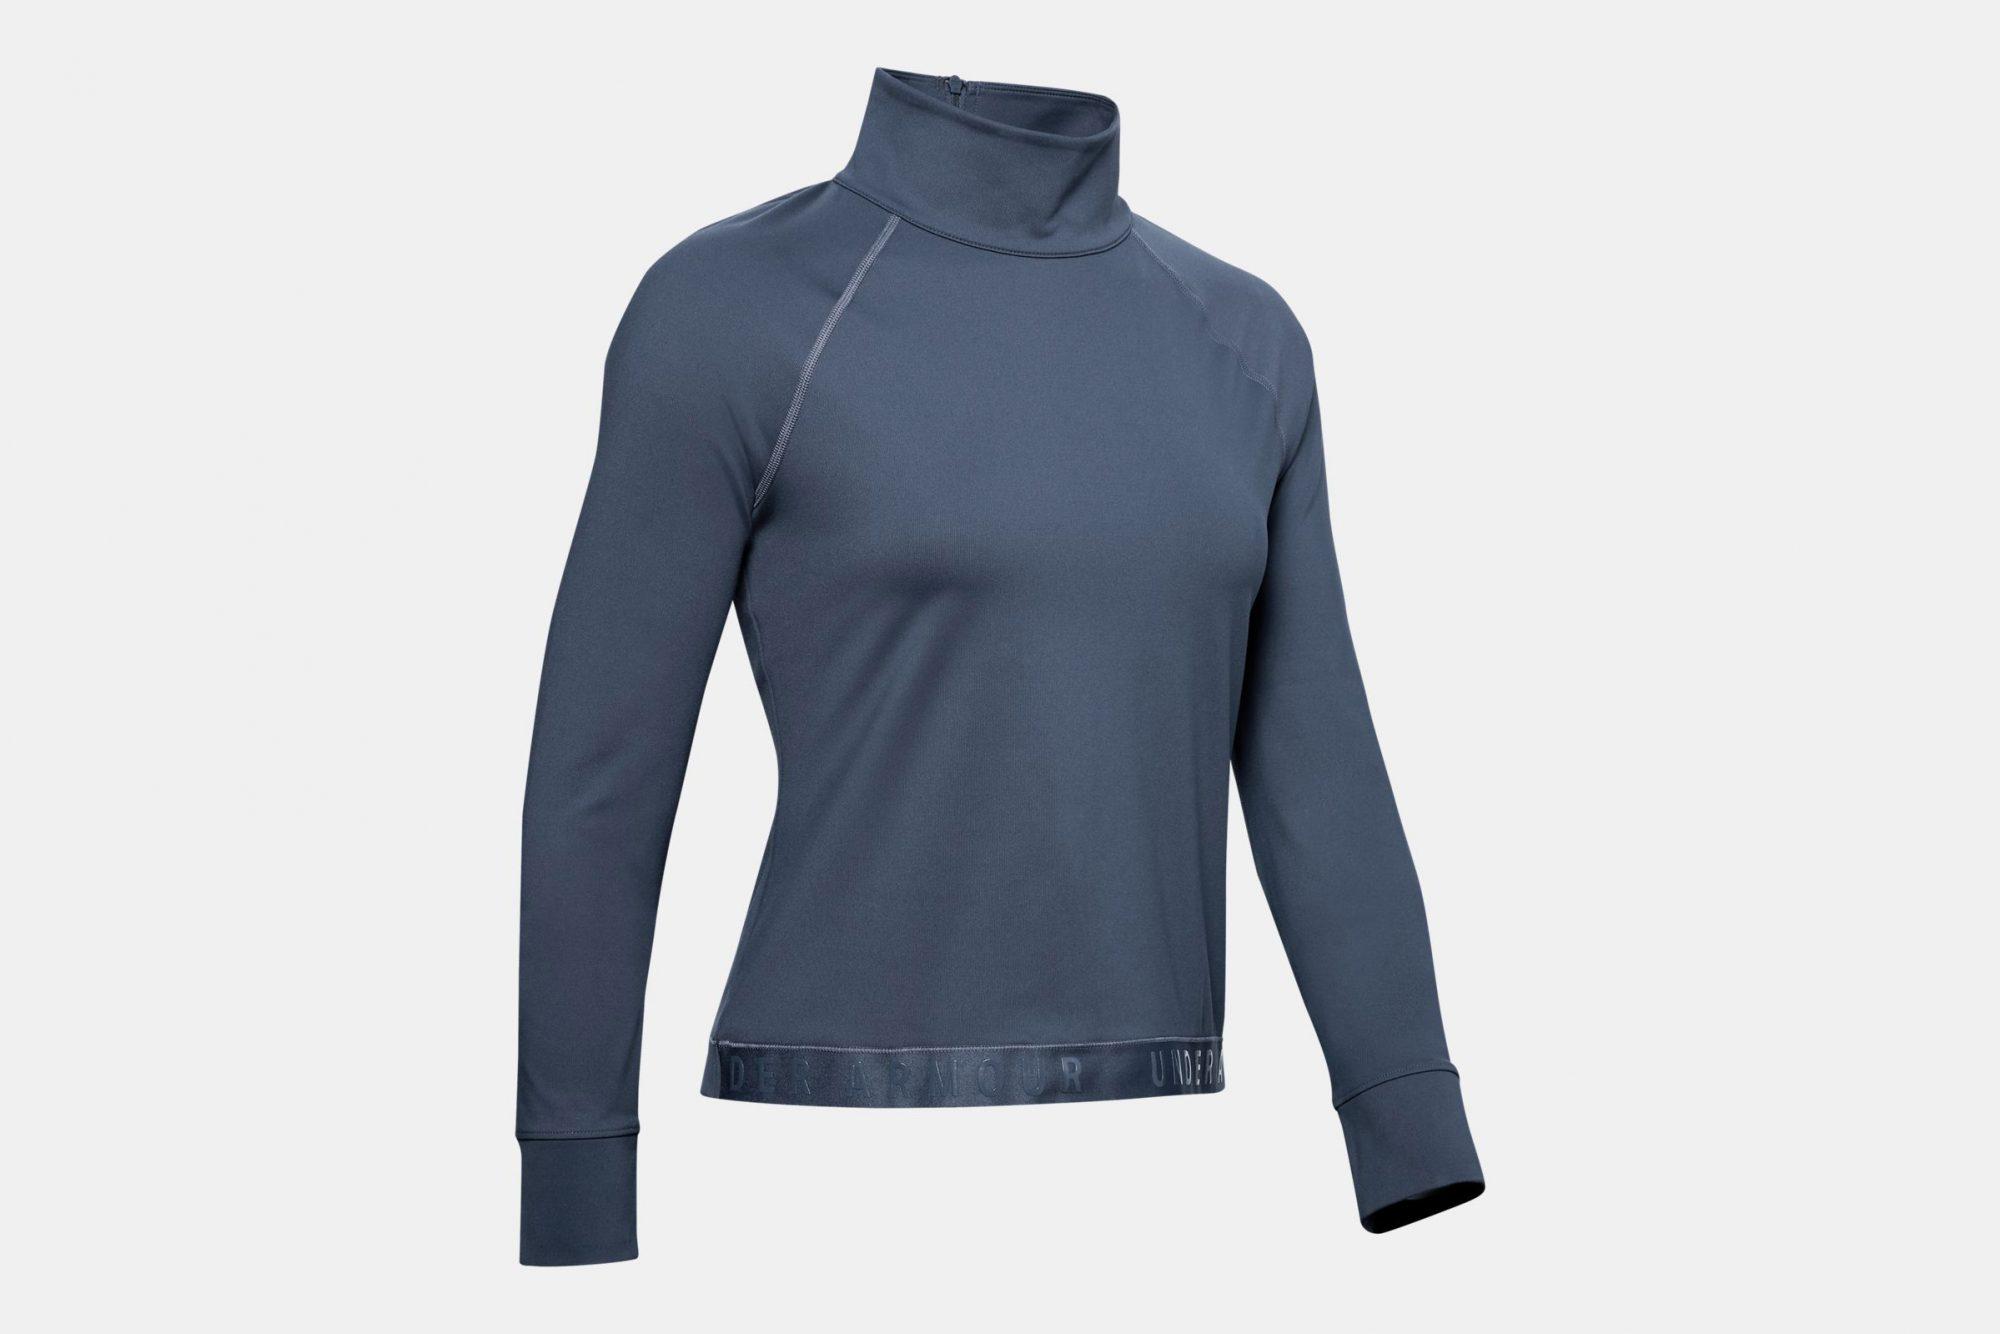 winter-activewear-under-armour